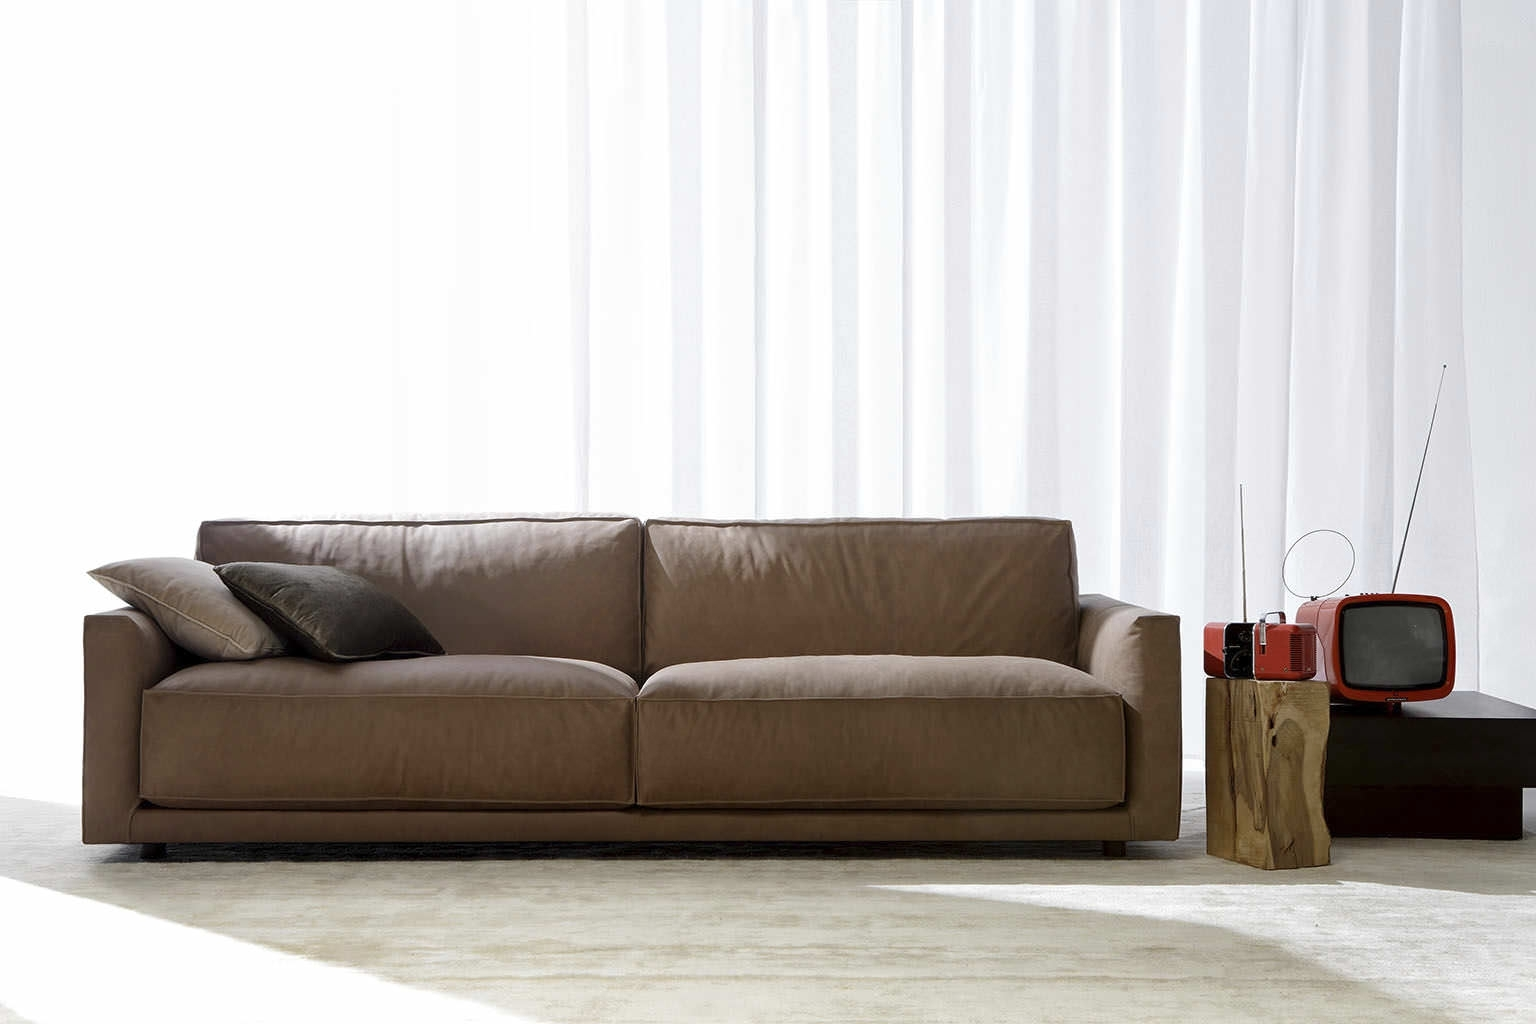 Modern Living Room Regarding Newest Modern Sofas (View 6 of 15)